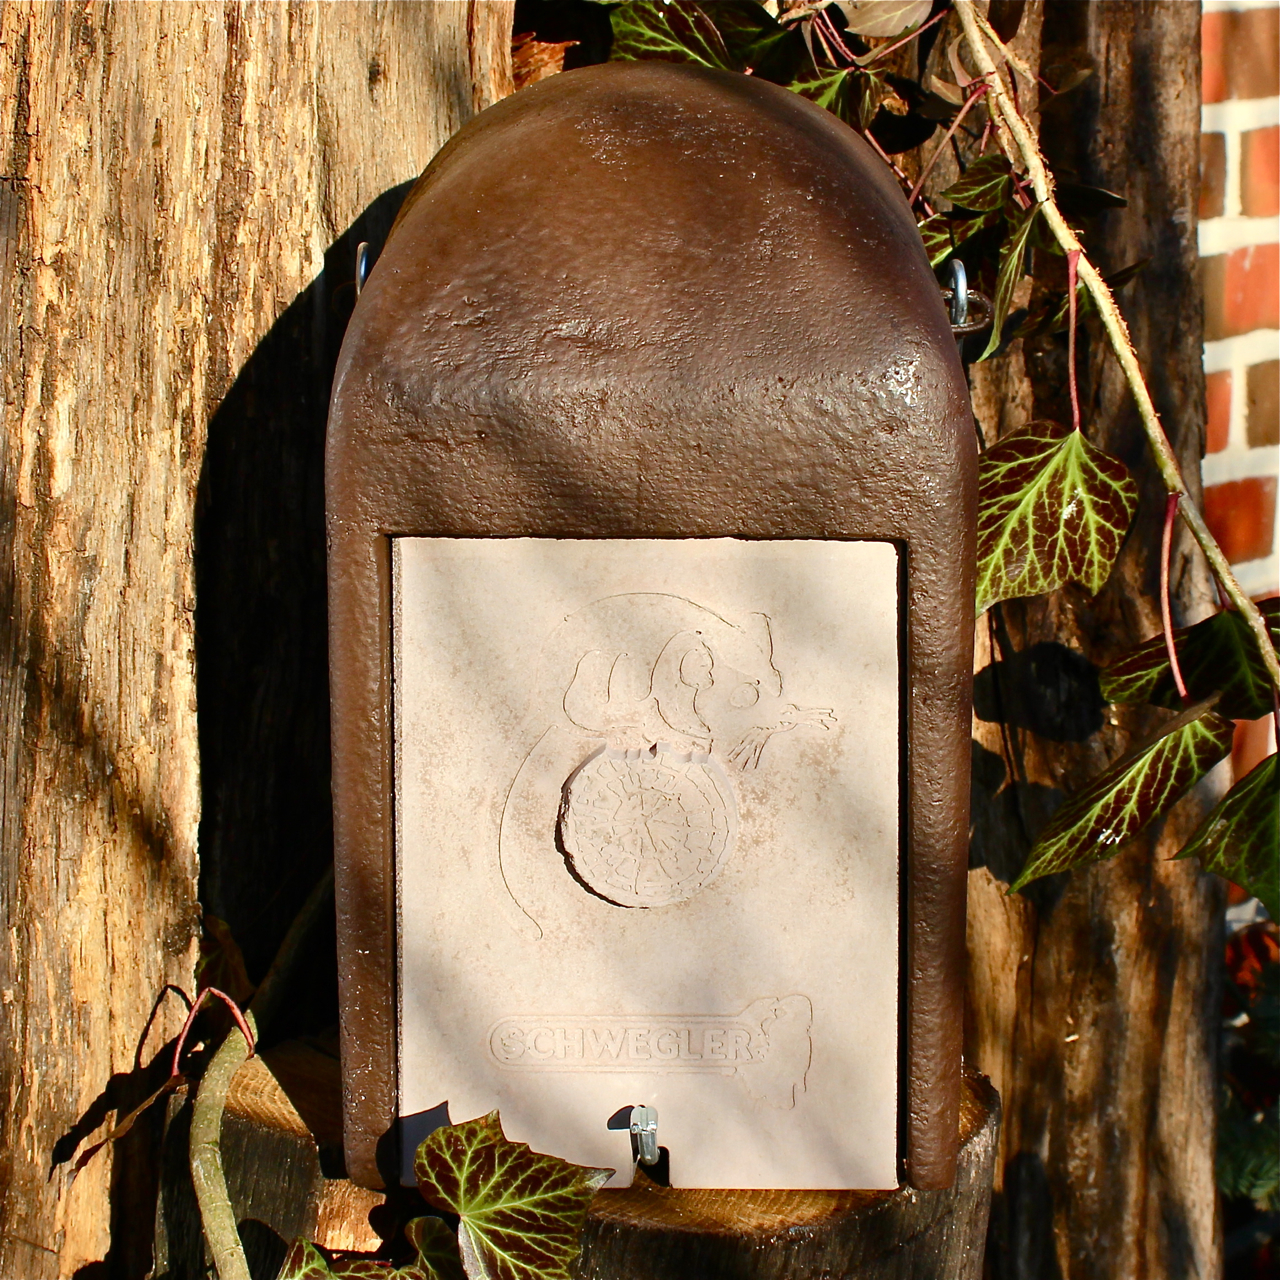 schwegler schläferkobel haselmauskobel siebenschläferkobel - vogel